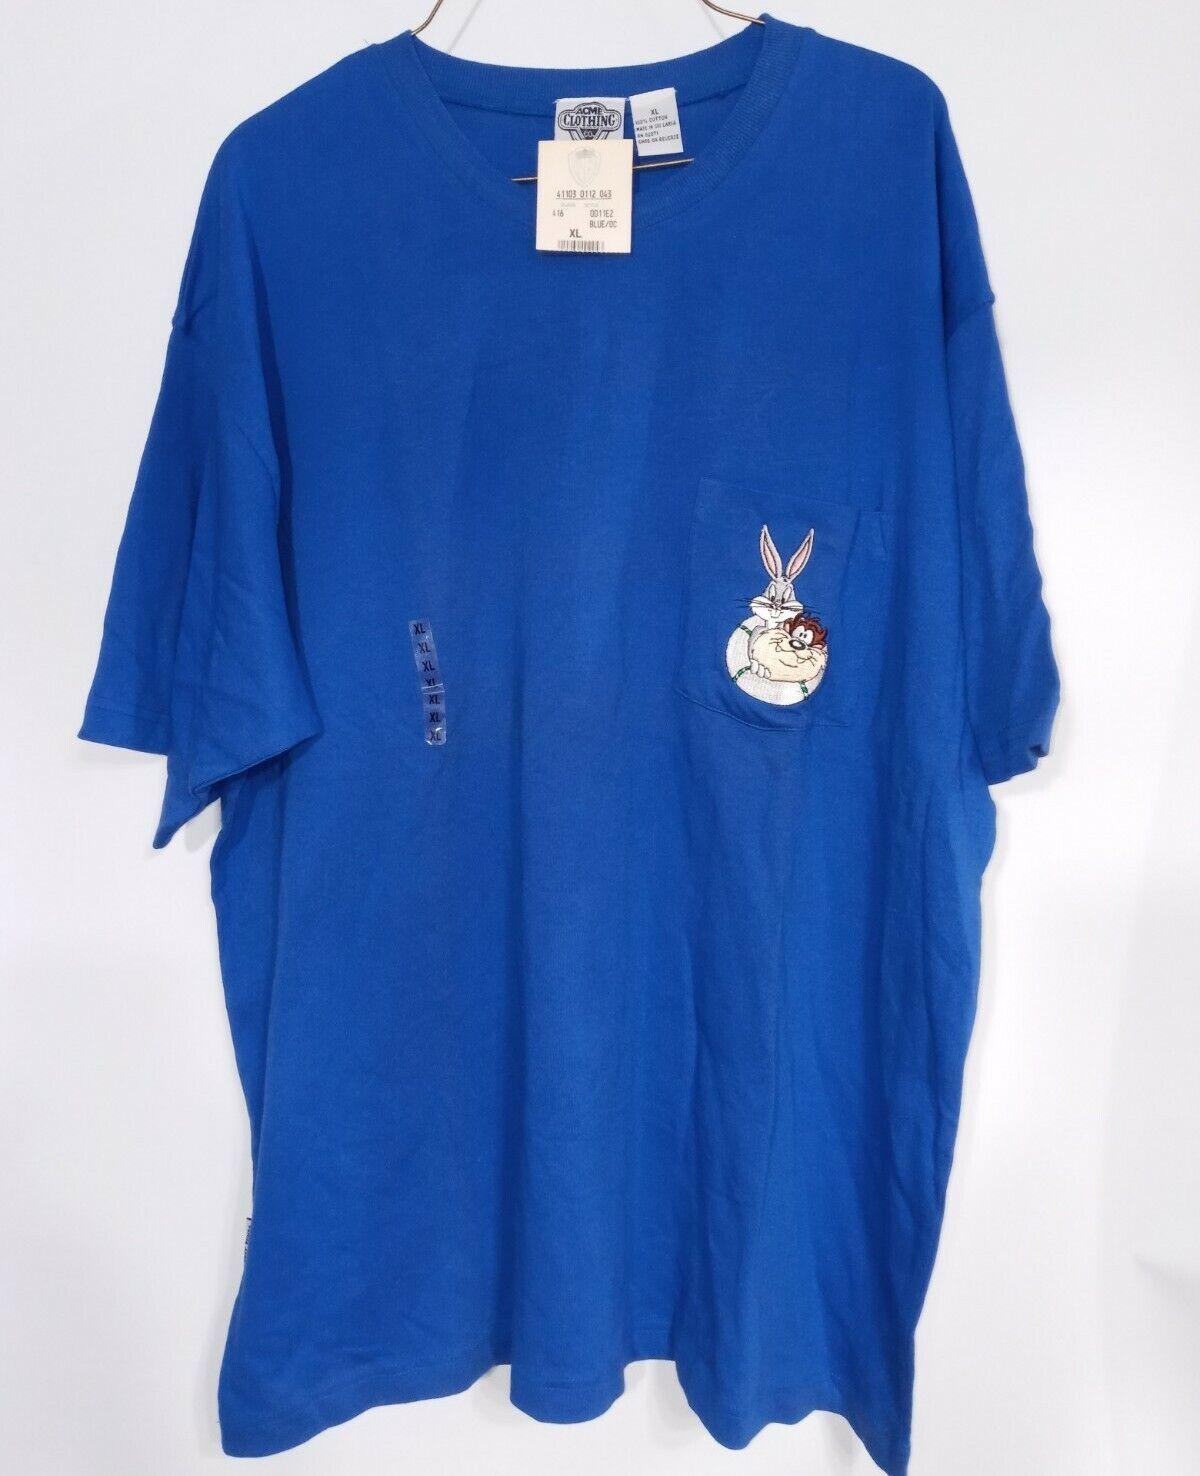 Vintage Acme Clothing Co. Blue T-Shirt Buggs Bunny & Taz, XL